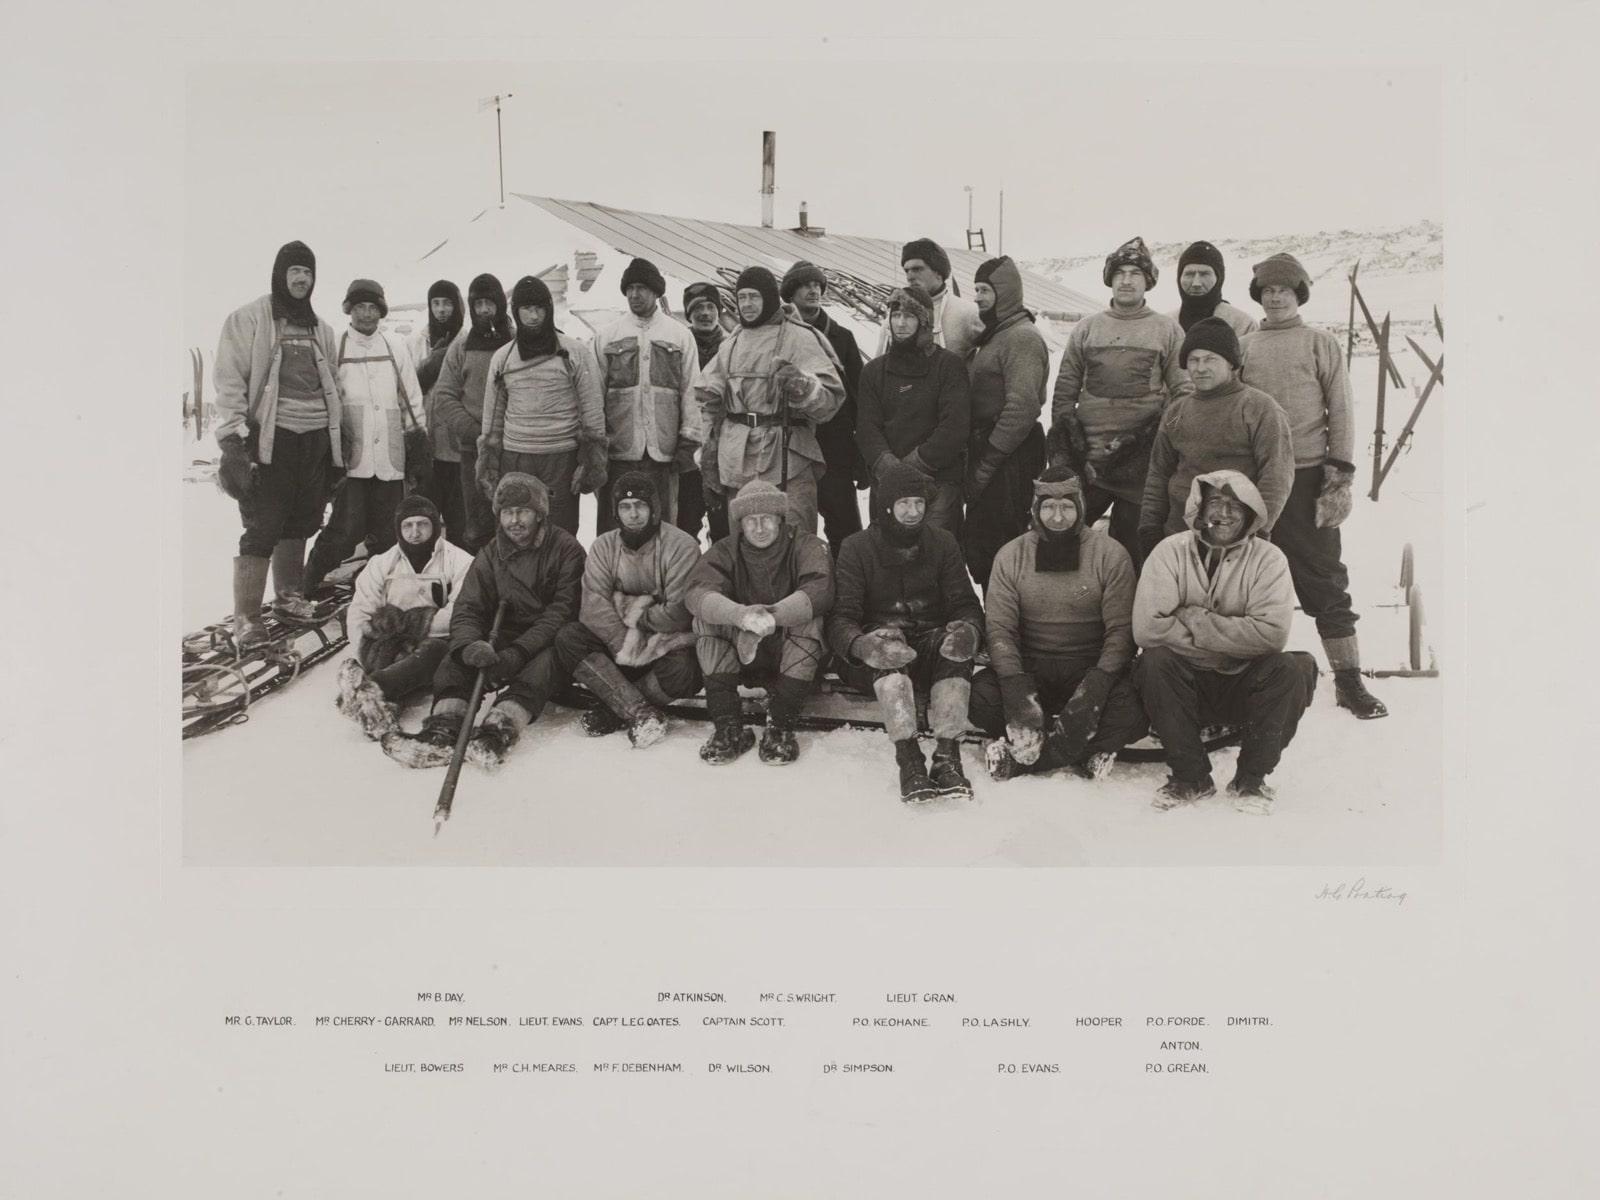 The team of Scott's 1910-1913 British Antarctic Expedition. Photo by Herbert G. Ponting/ © Victoria and Albert Museum, London